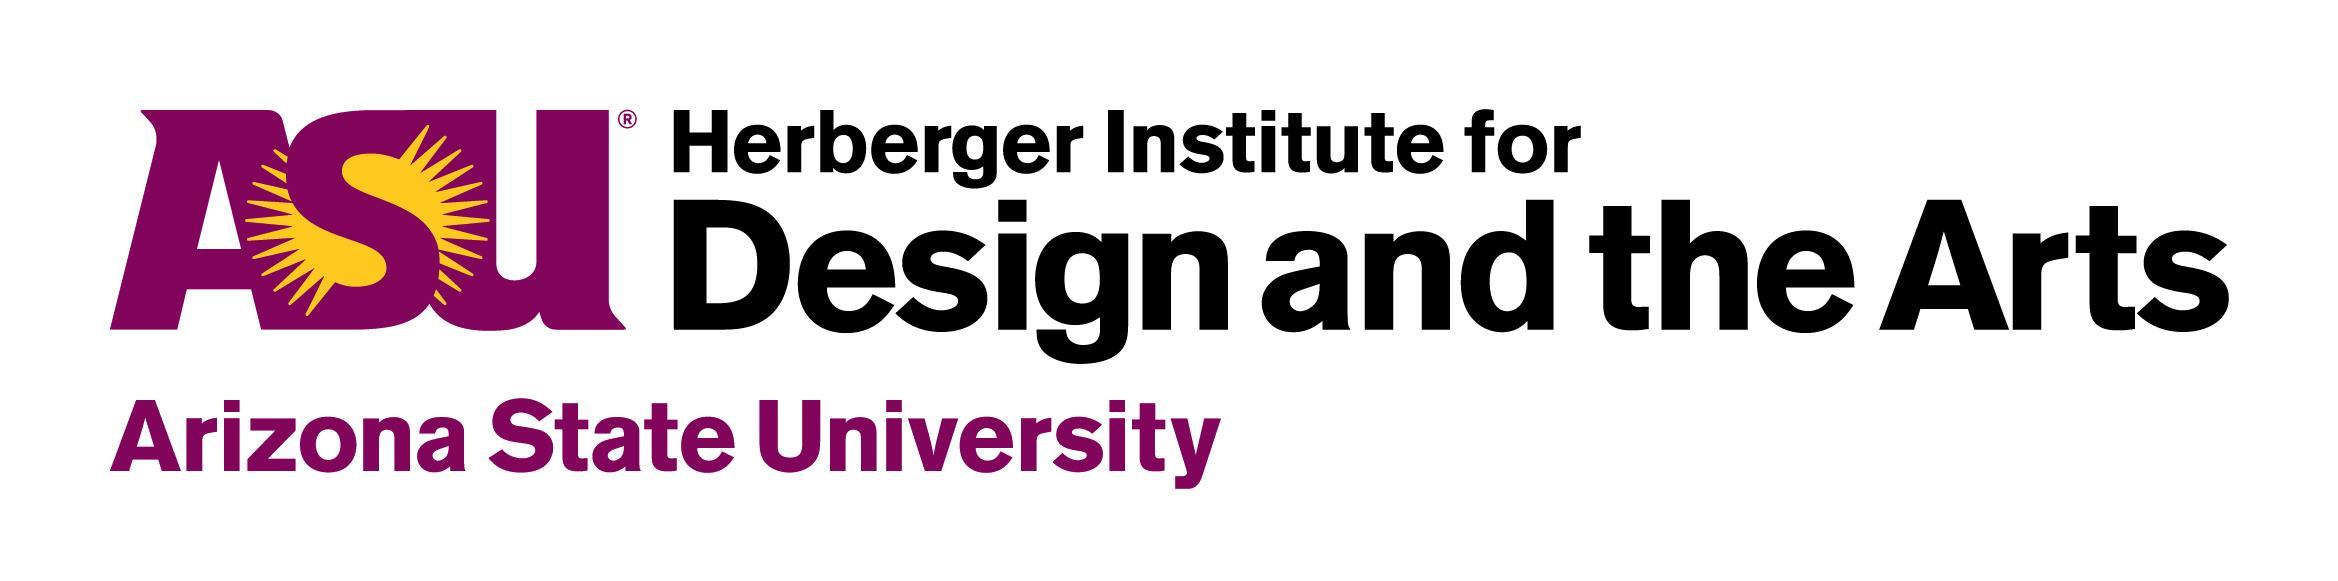 Herberger Institute logo